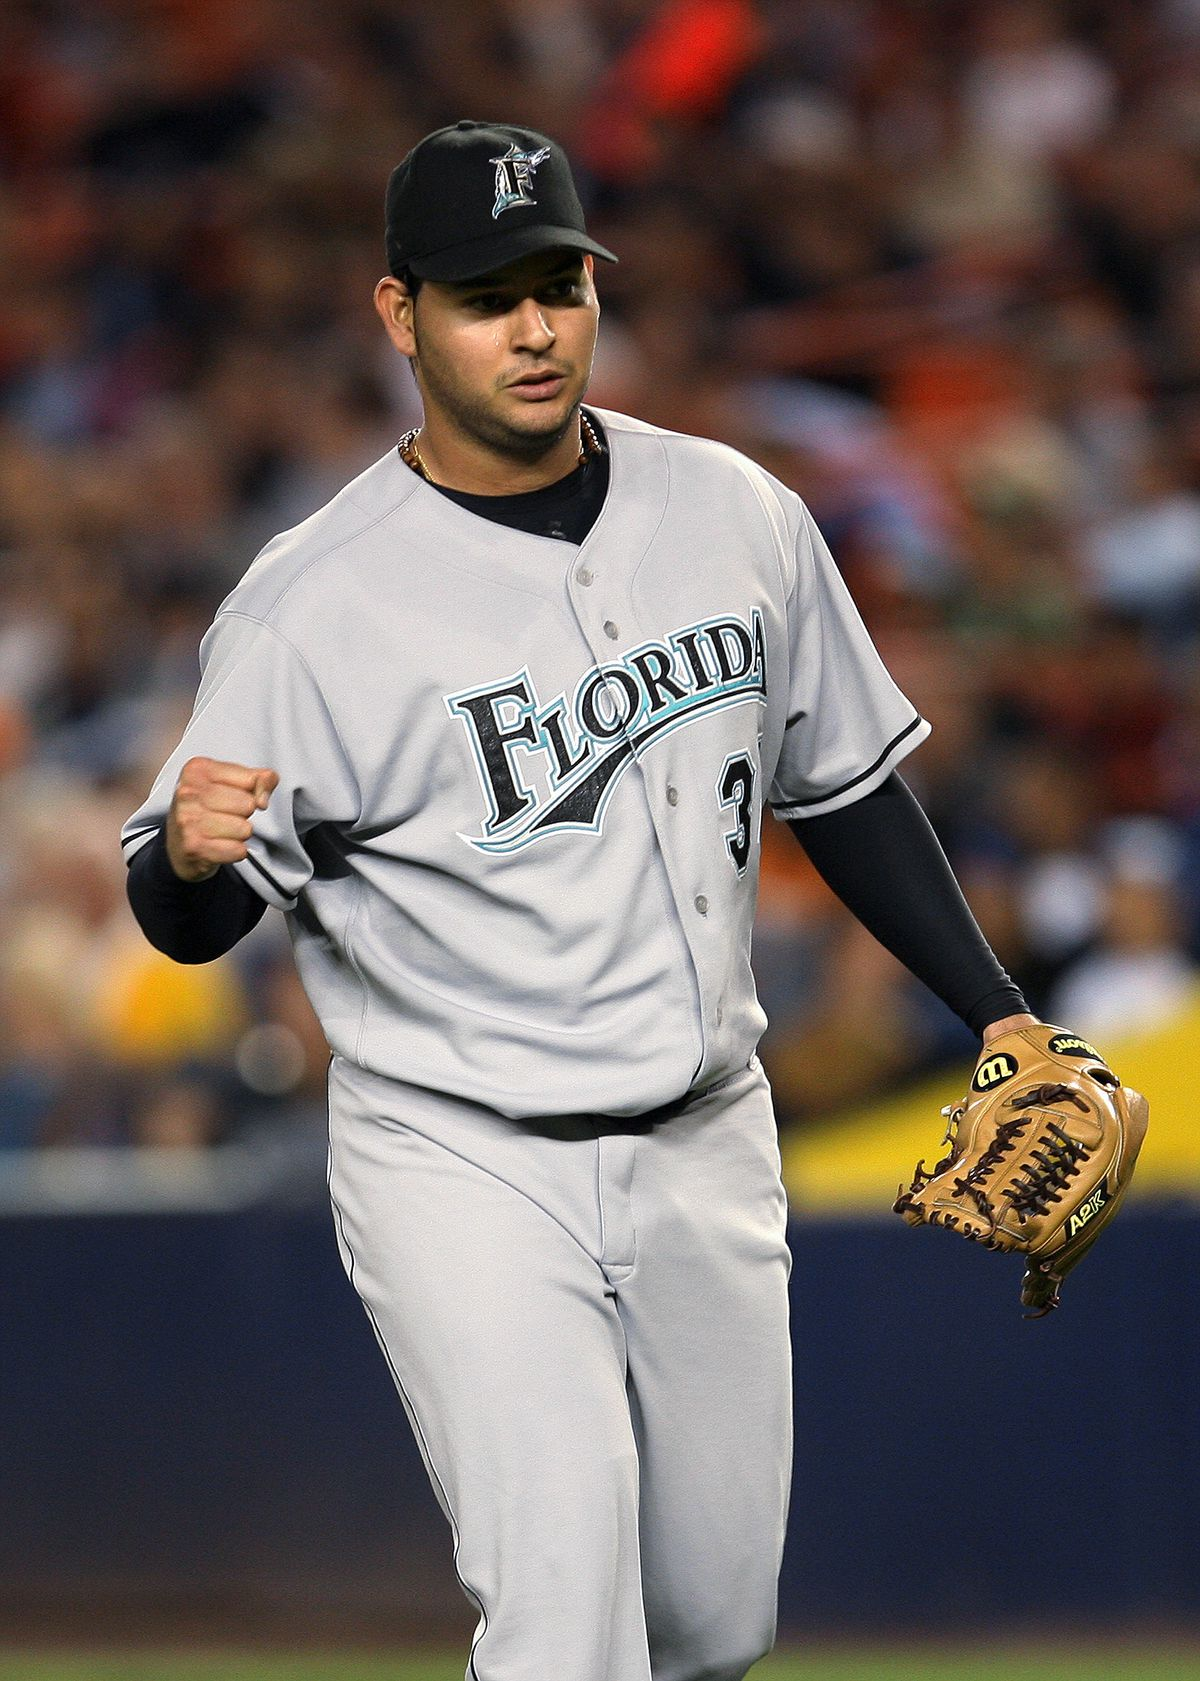 Florida Marlins' starter Anibal Sanchez pumps his fist as he